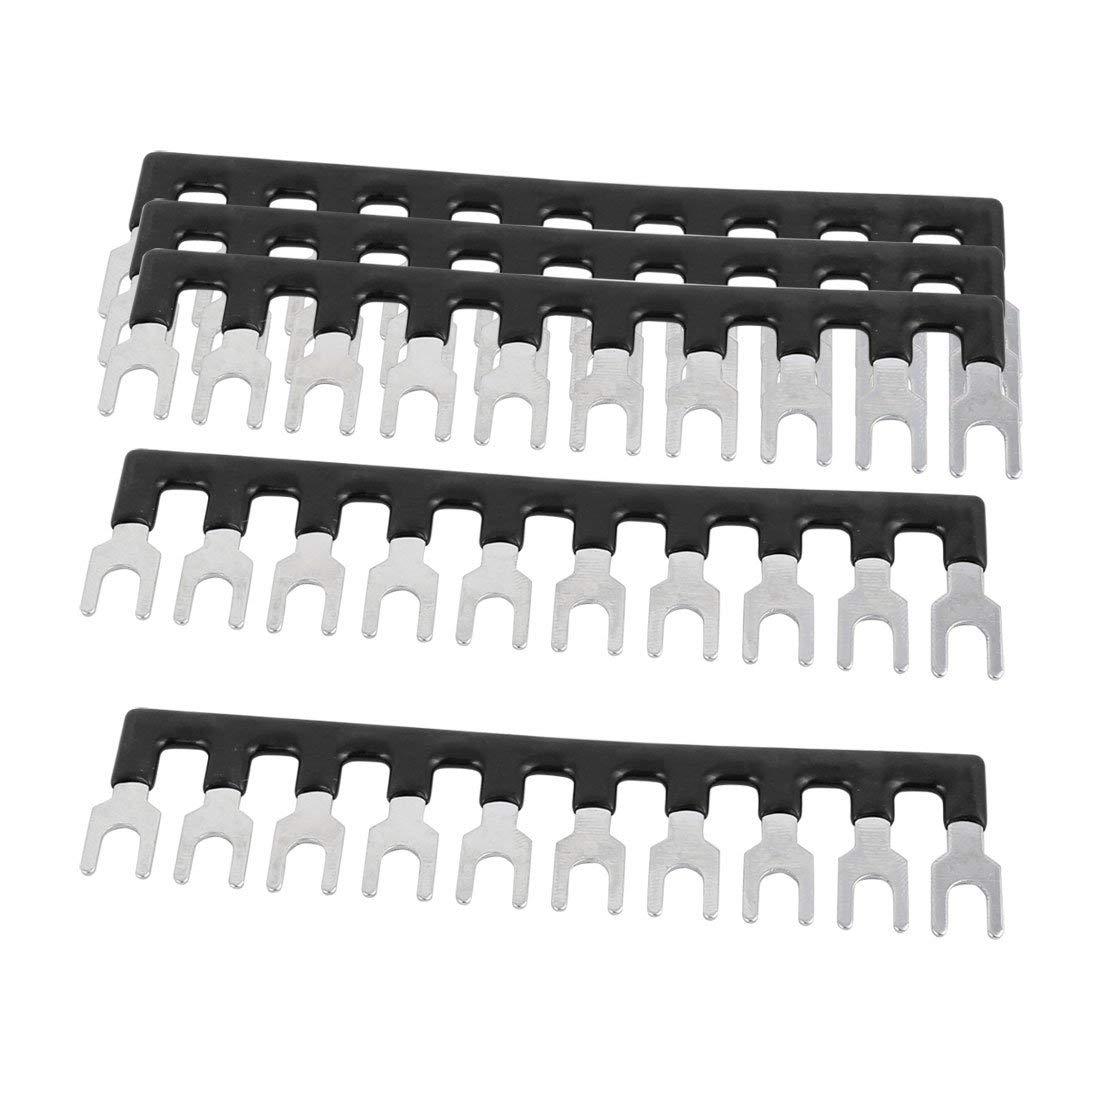 uxcell 5PCS TBD-20A 6mm Pitch 10 Position PCB Terminal Block Strip Barrier Black